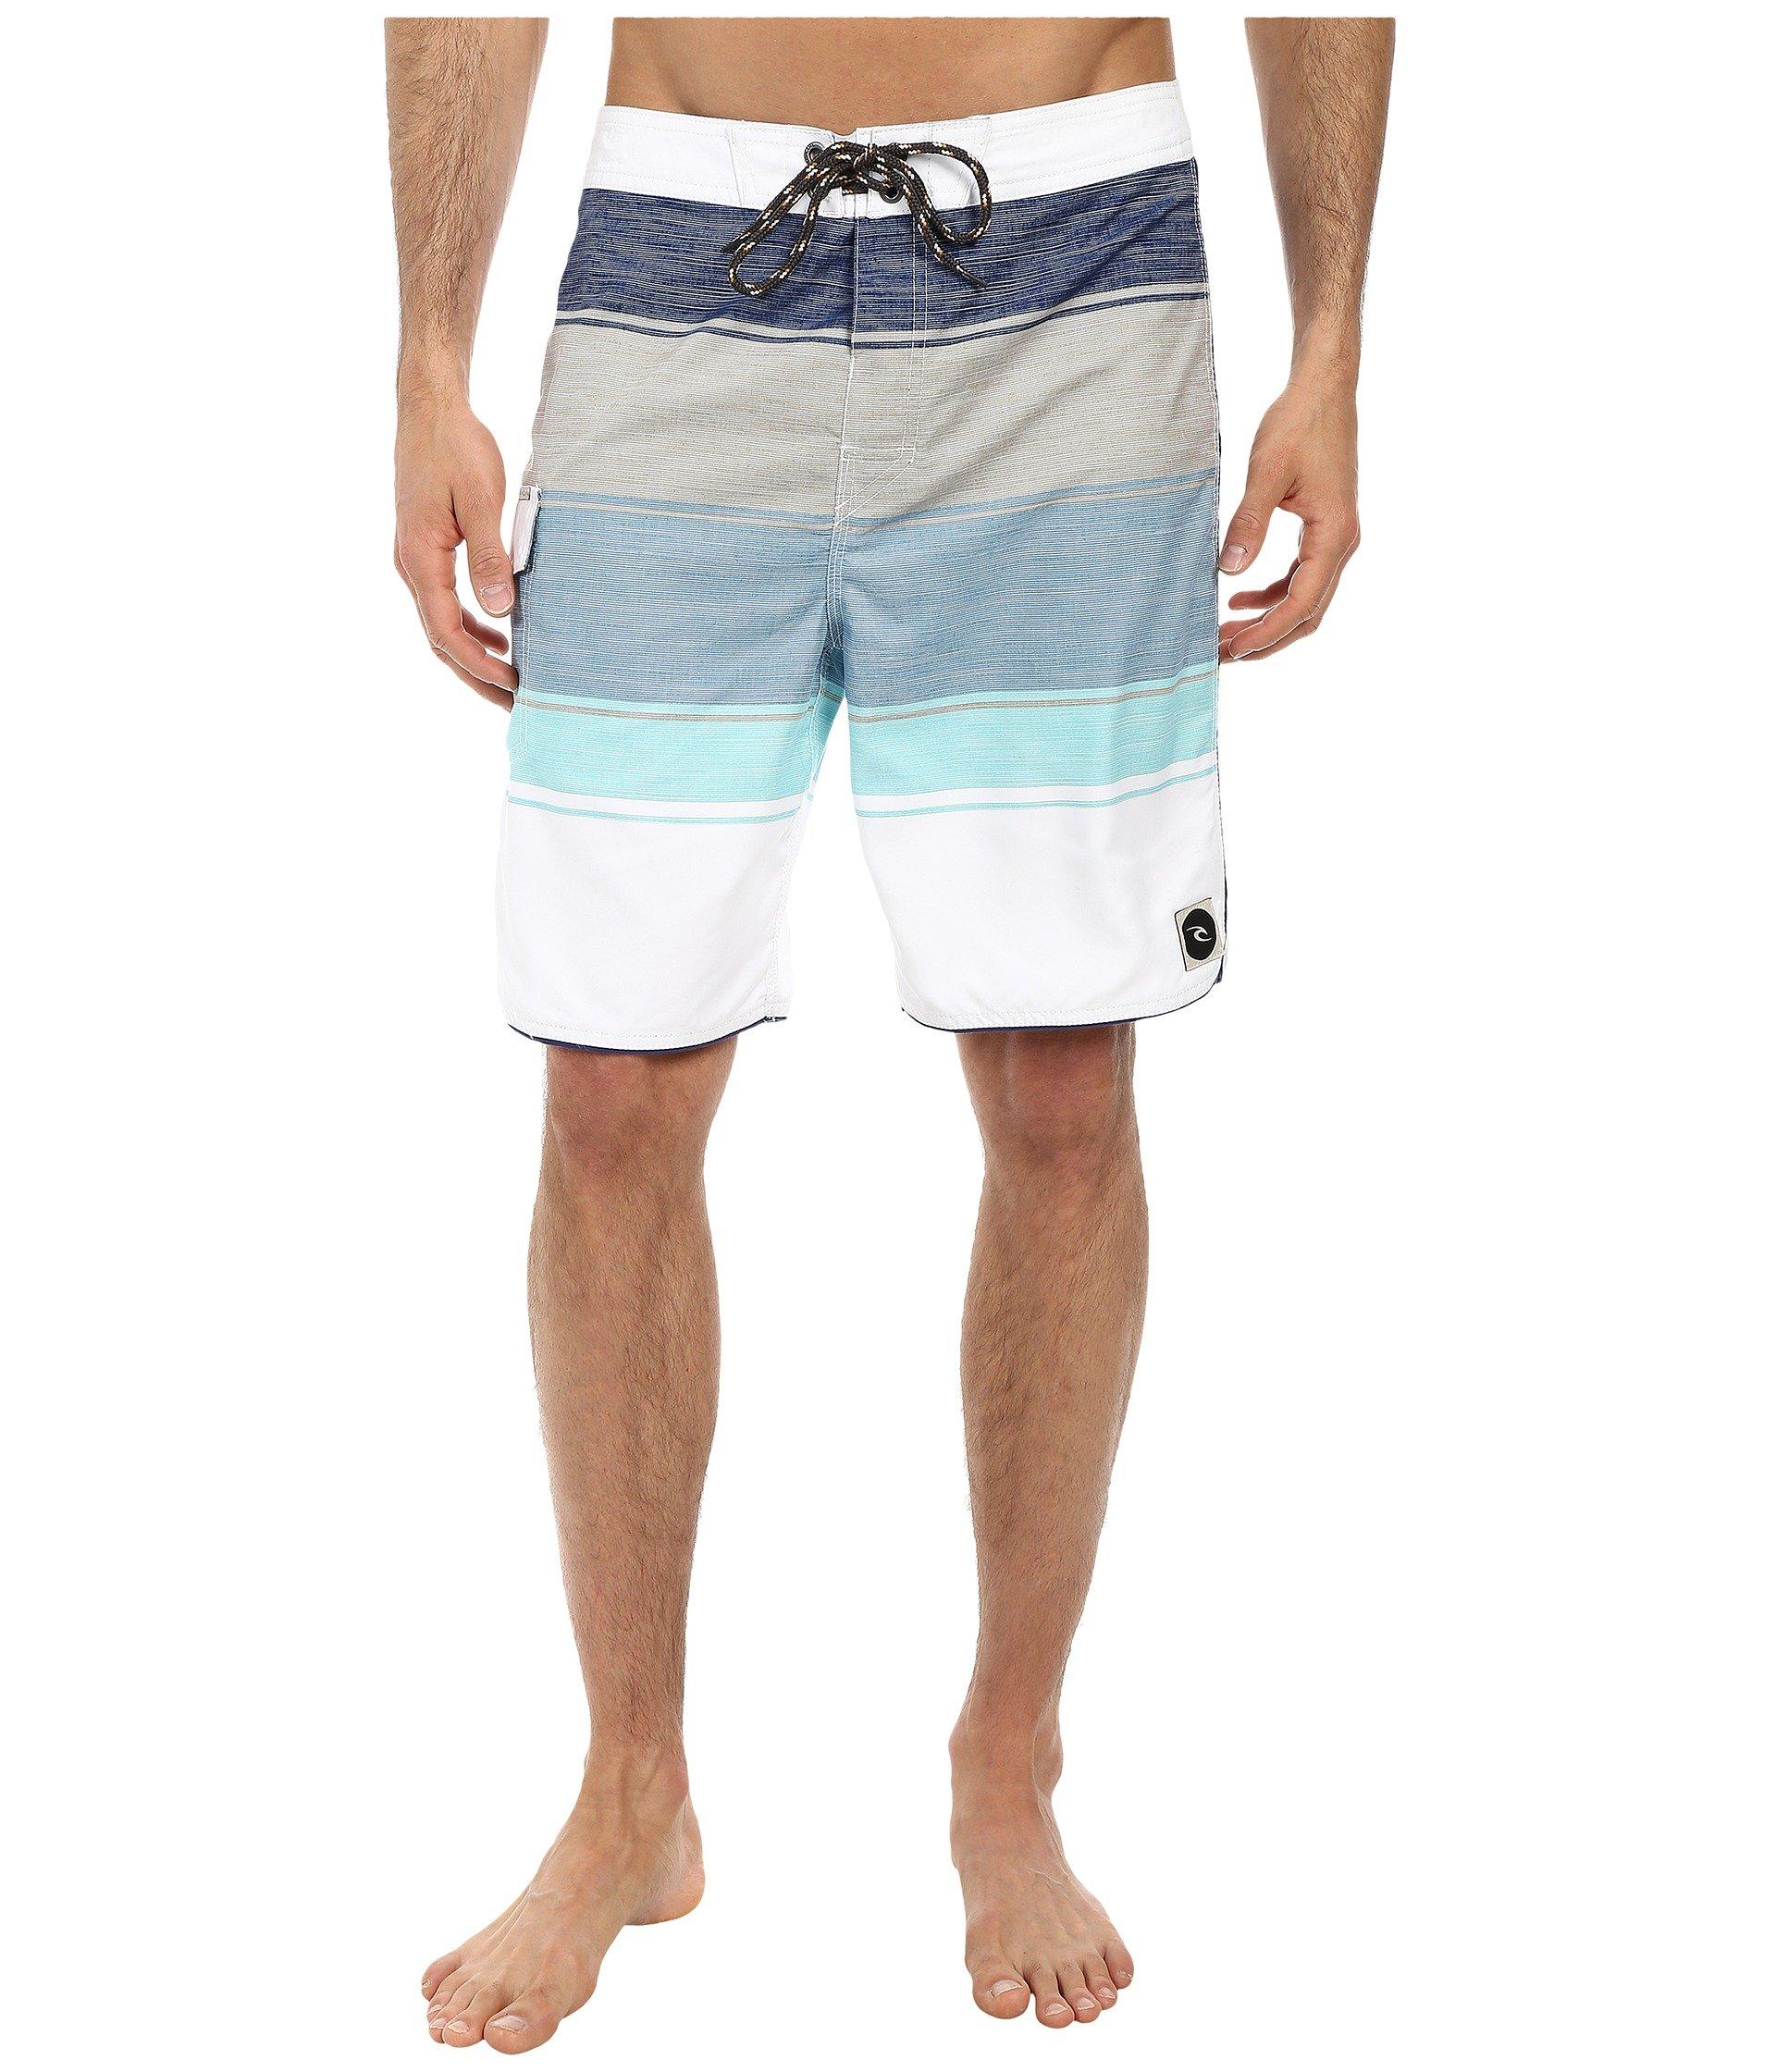 bd829aa6ae Men's Rip Curl Swimwear + FREE SHIPPING | Clothing | Zappos.com